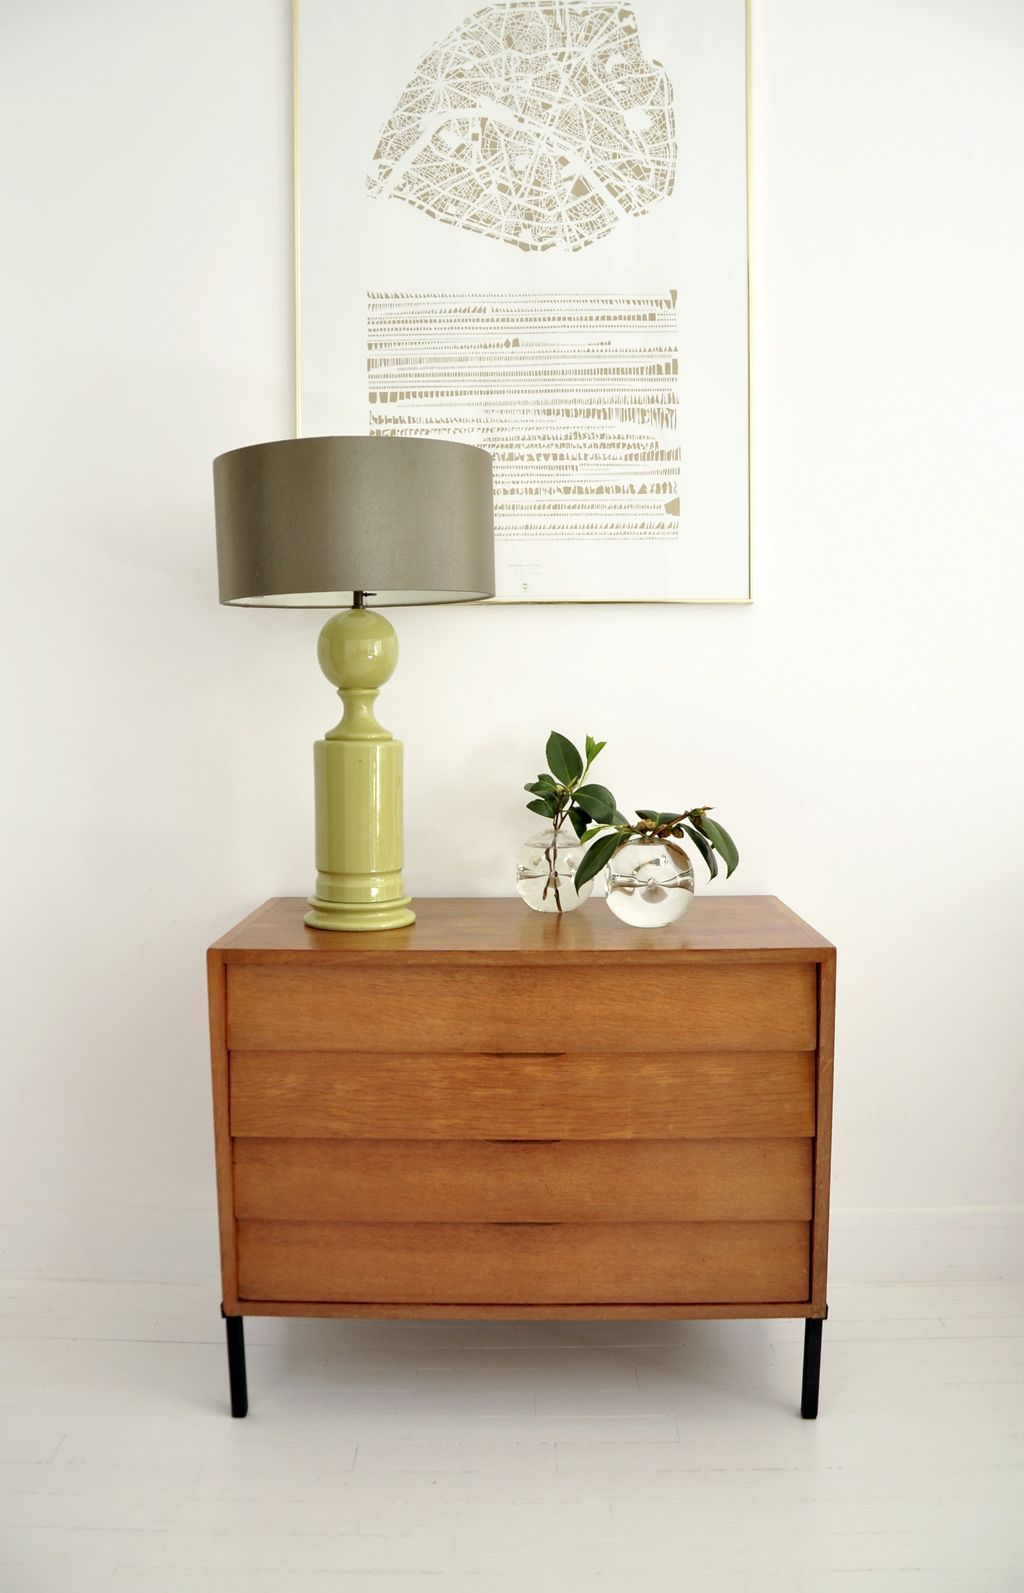 commode jacques hitier mobilor mobilier vintage bel ordinaire meuble vintage - Mobilier Vintage